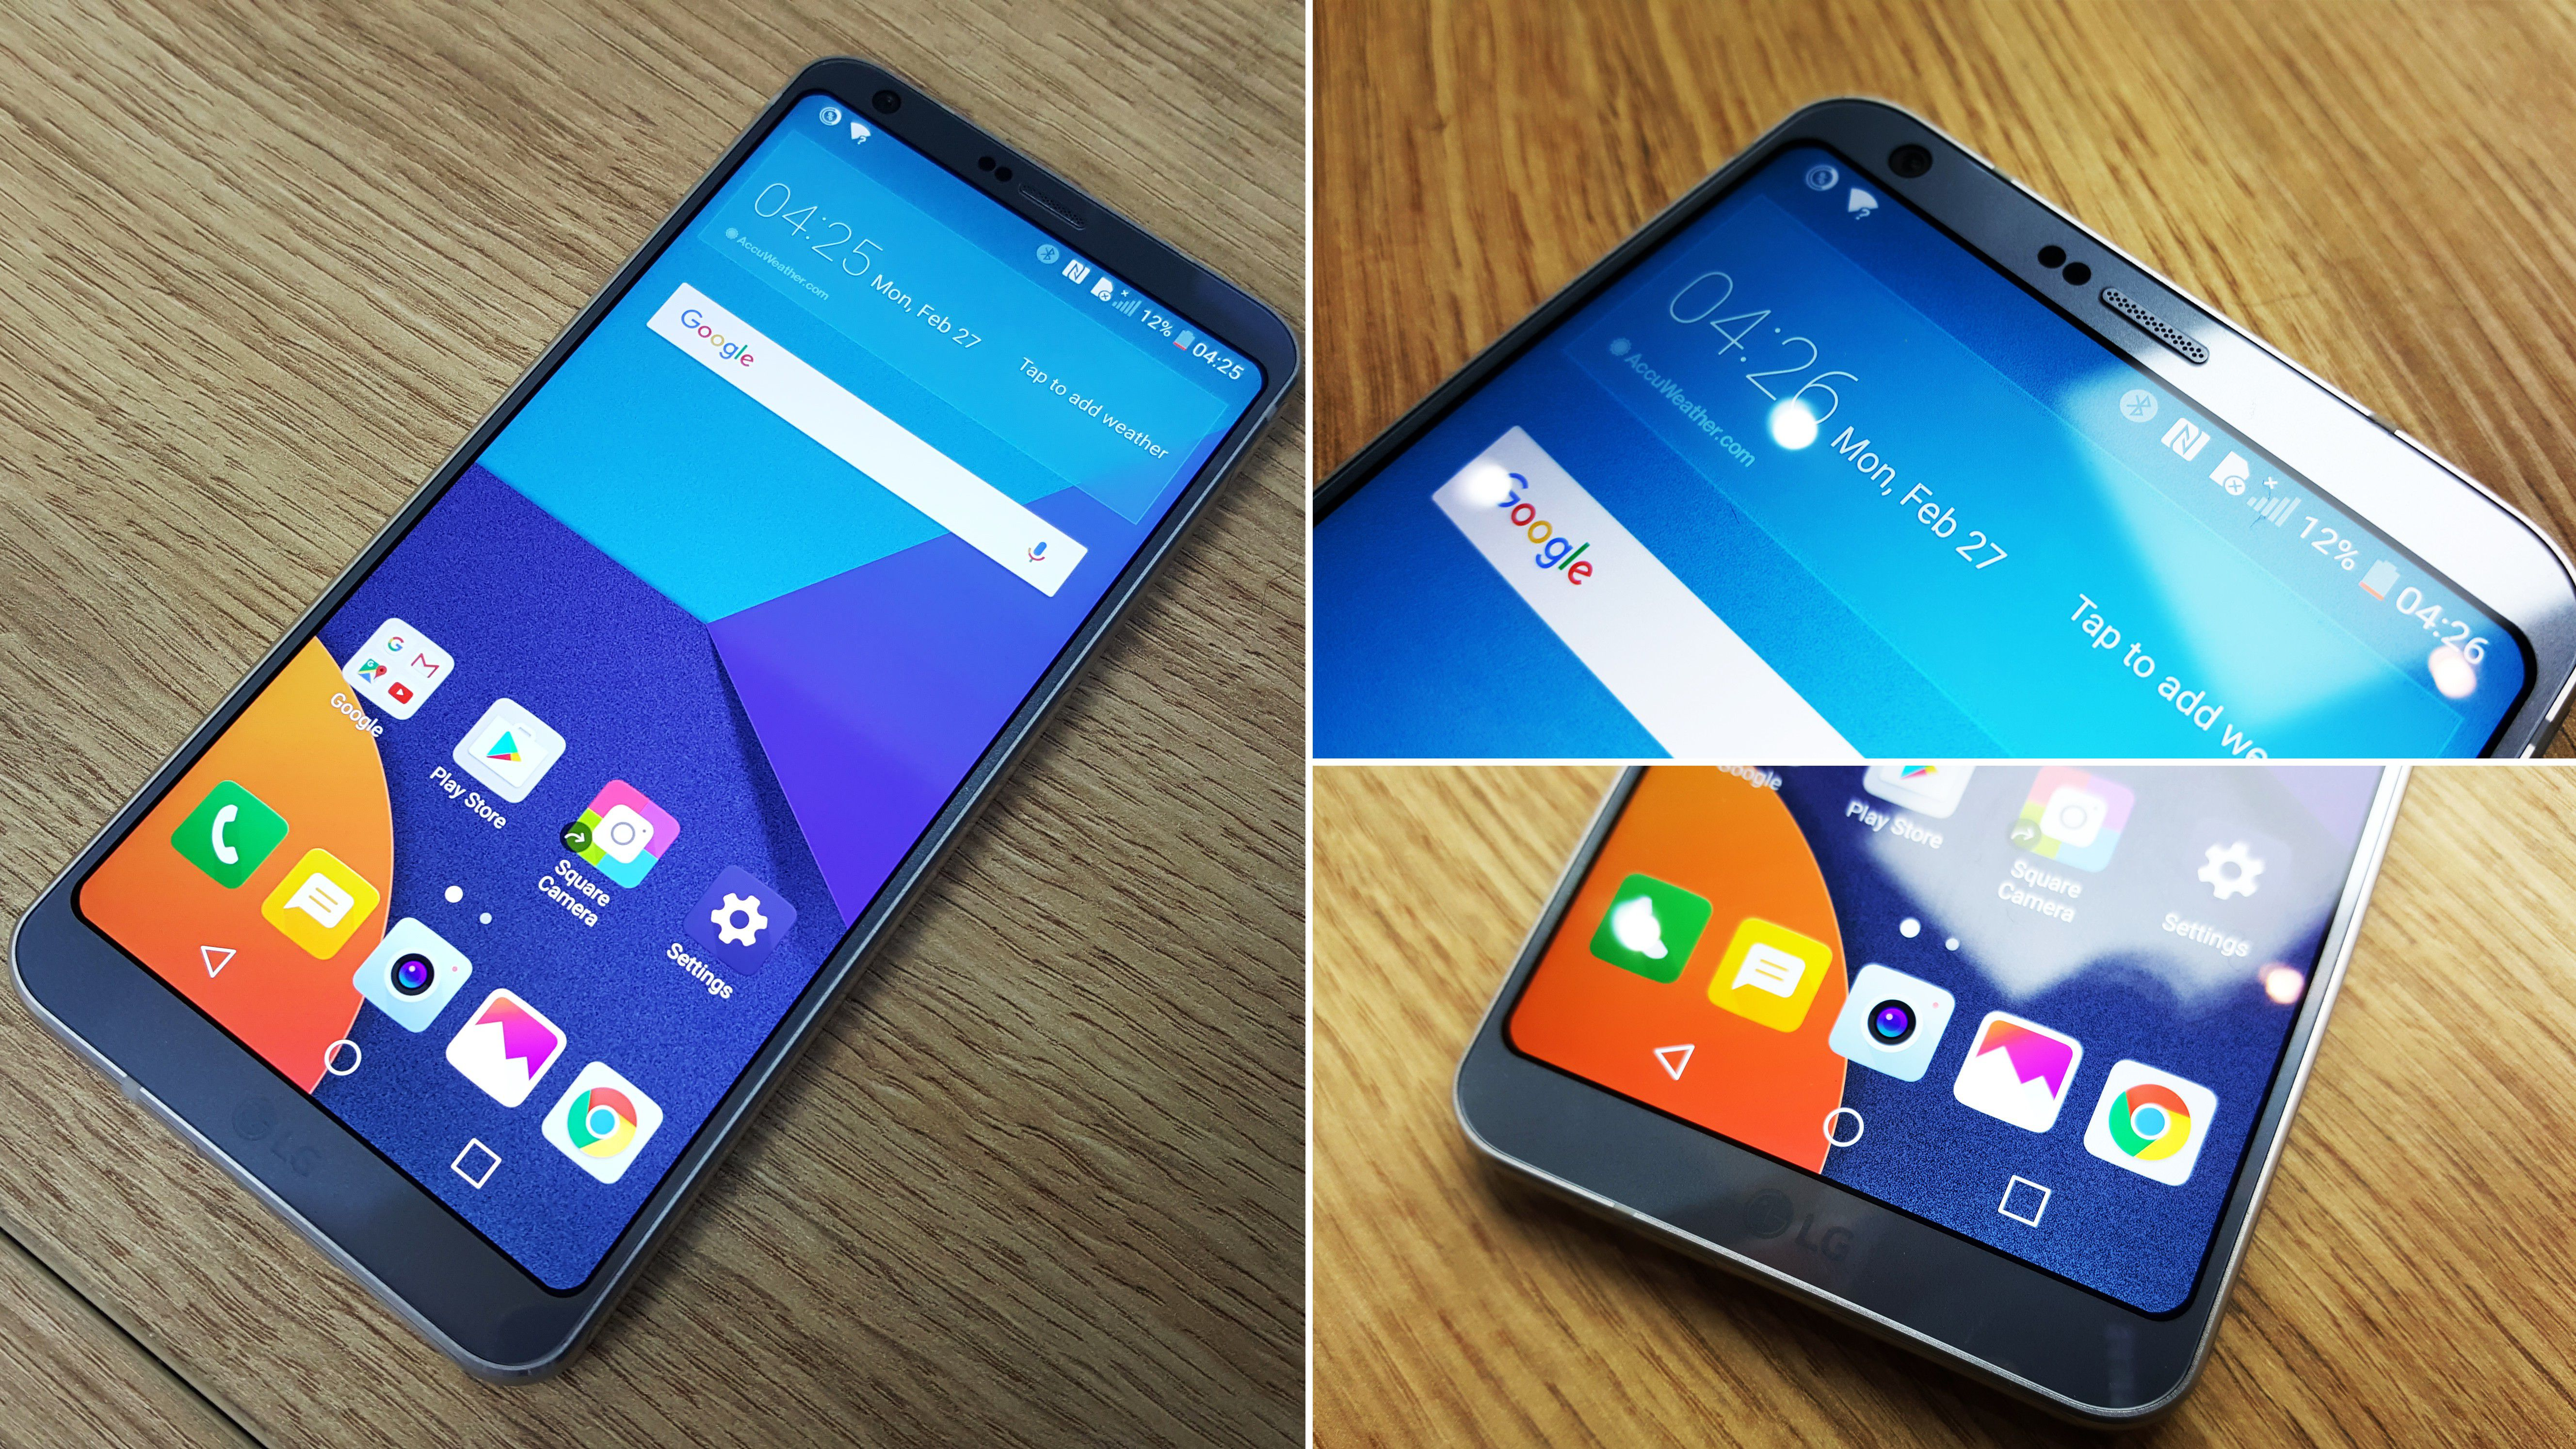 Le prochain smartphone LG haut de gamme sortirait en juin prochain